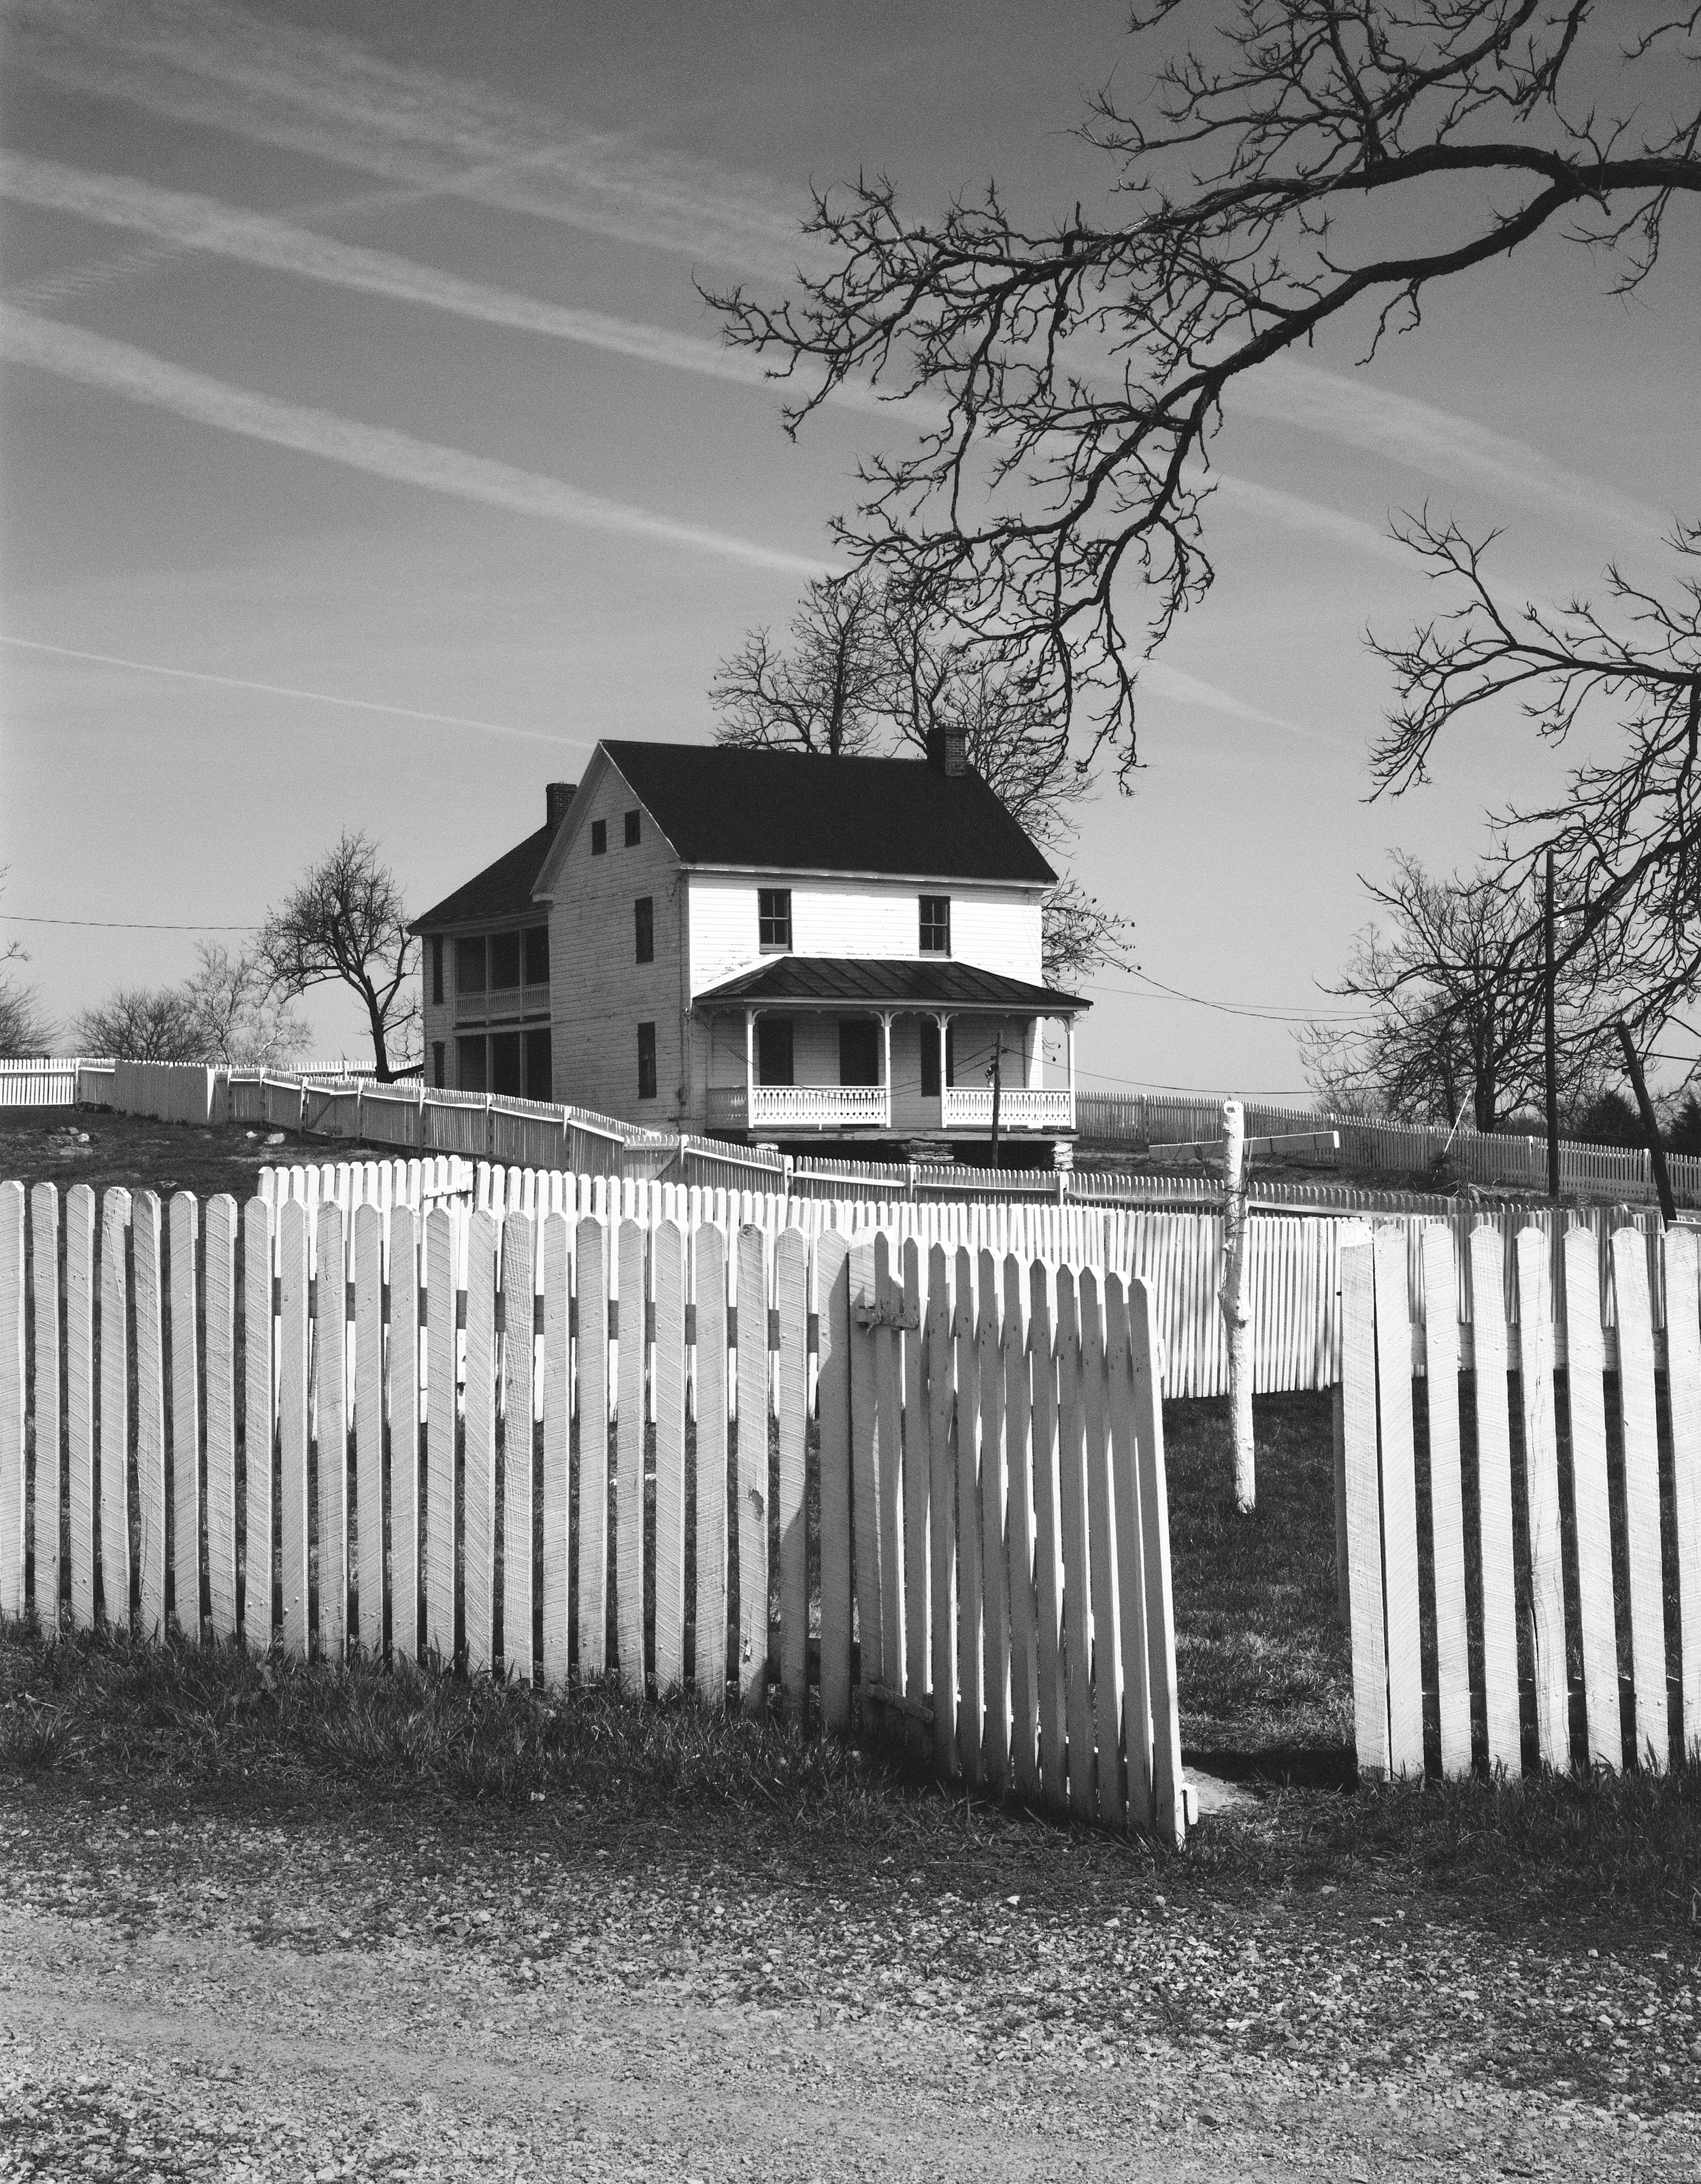 4x5_for_365_project_0102_Antietam_Poffenberger_Farmhouse.jpg